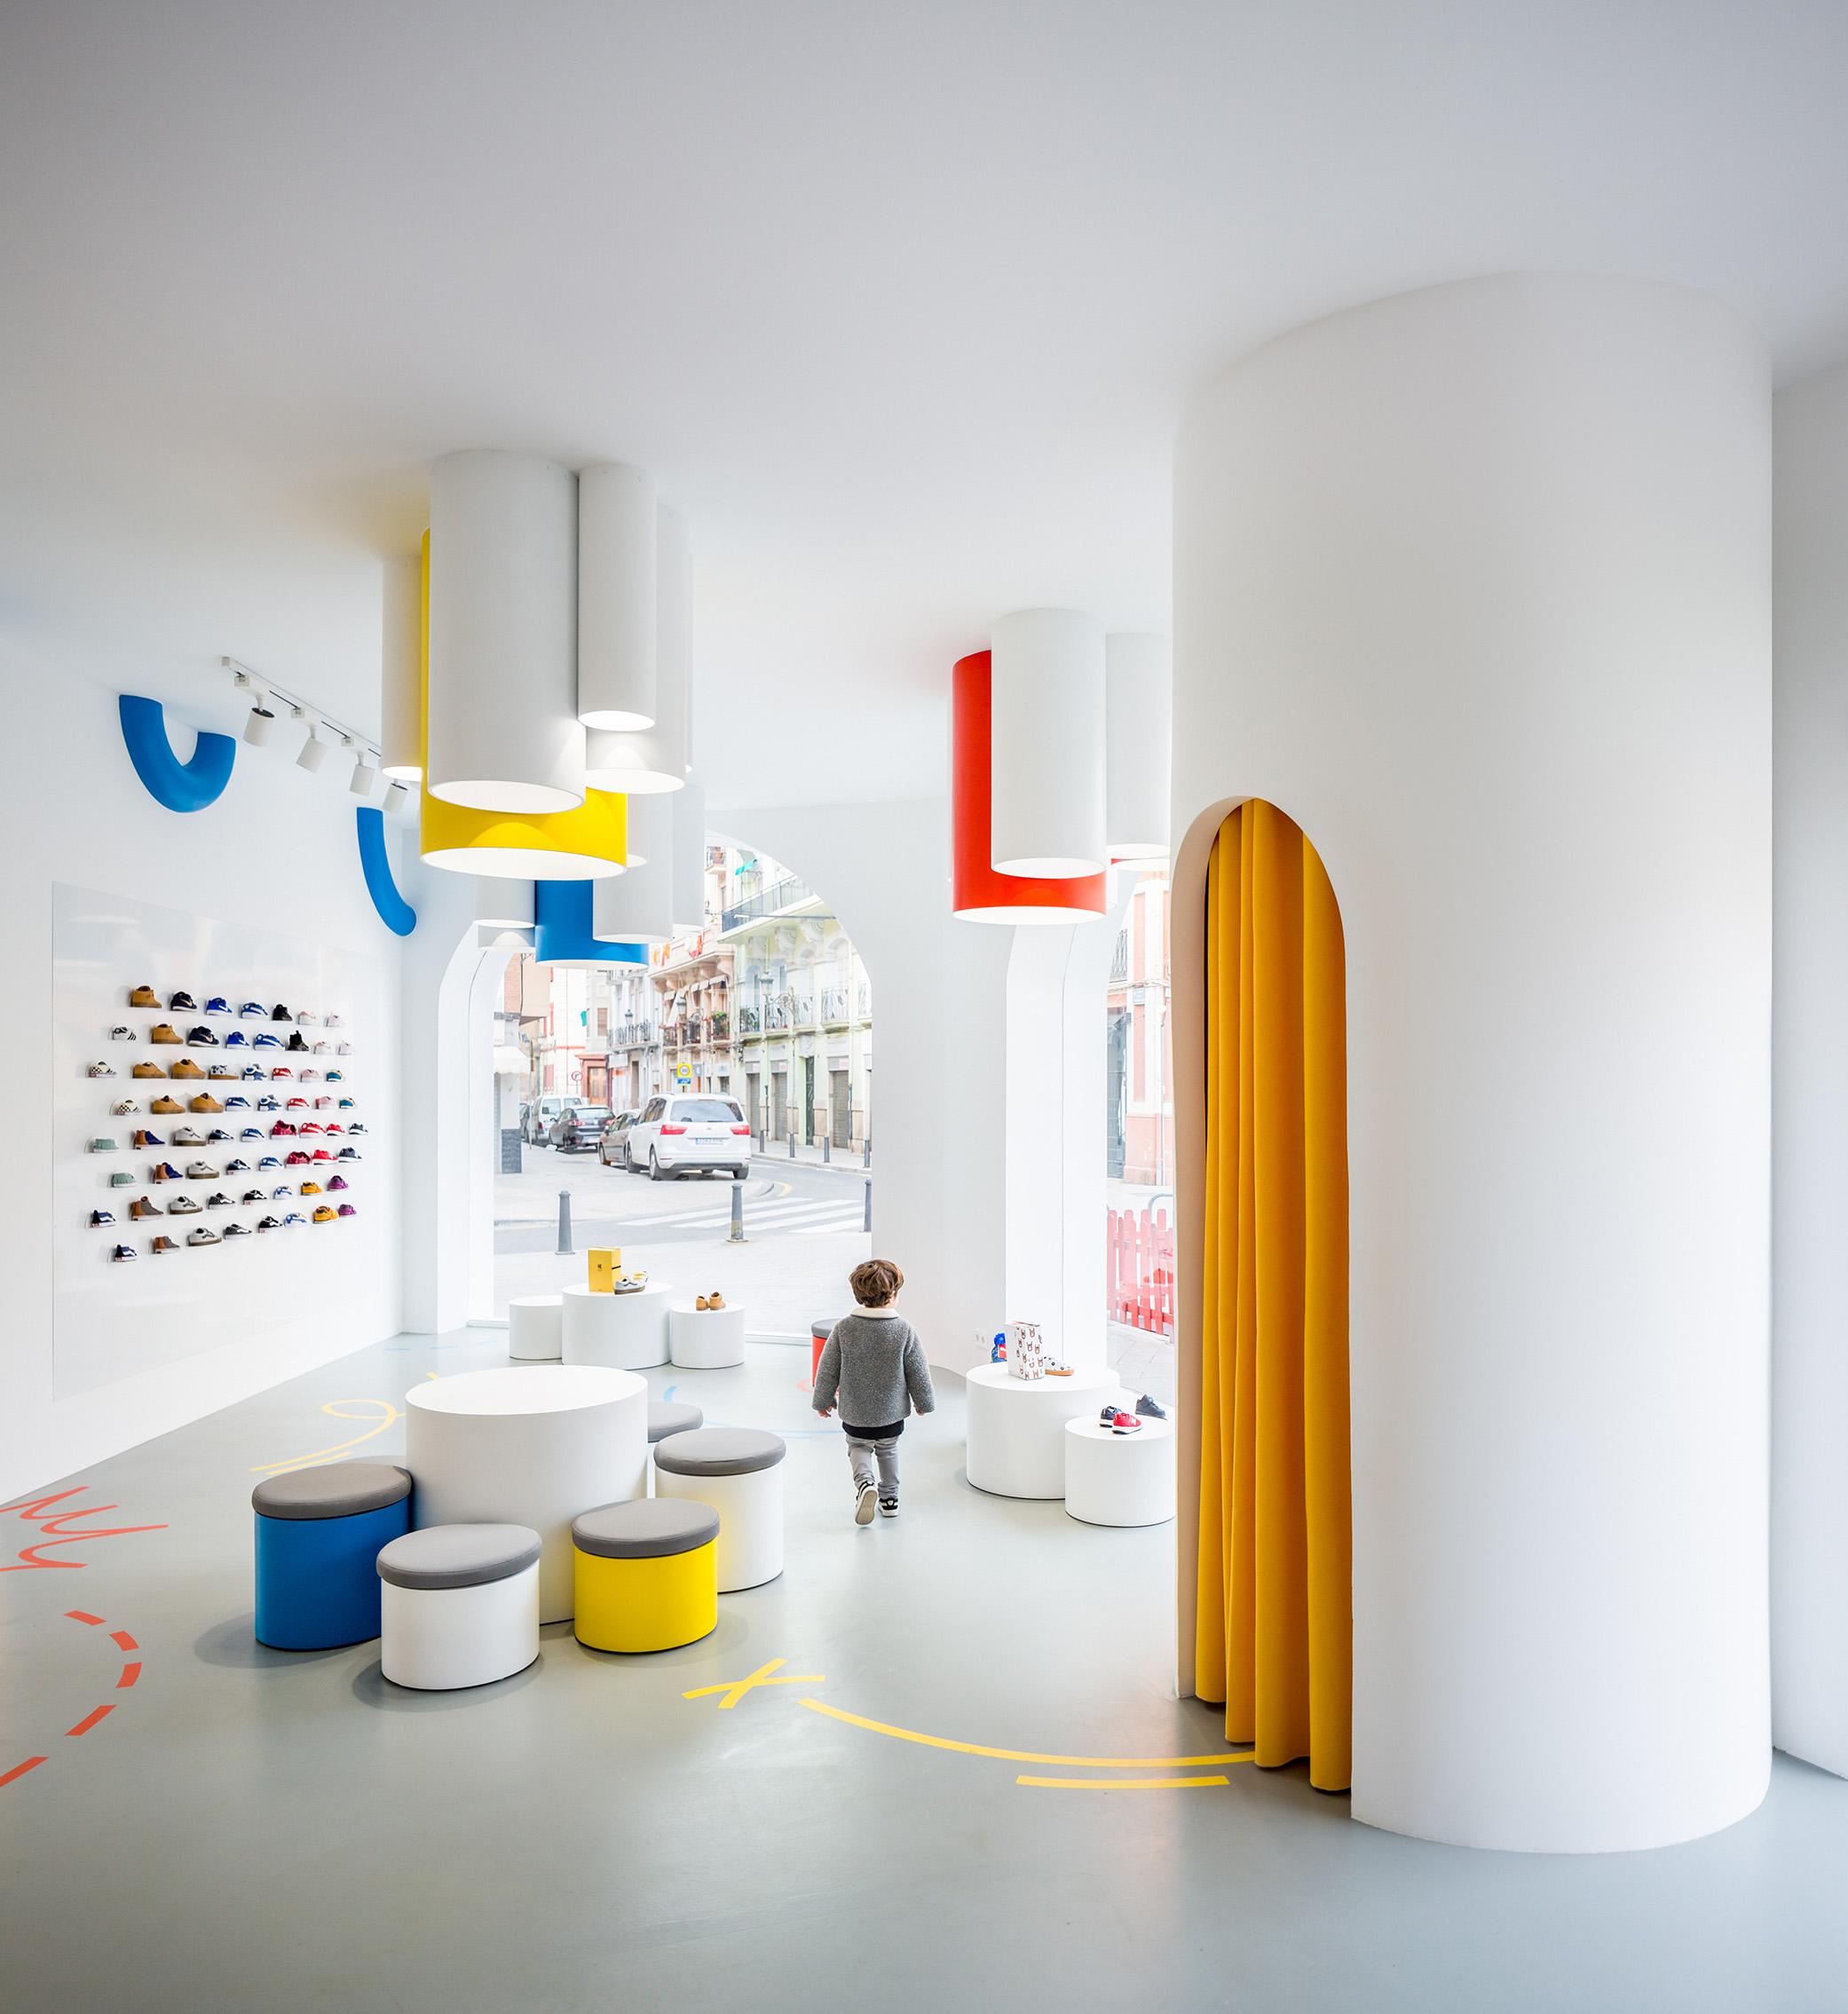 clap-studio-interior-design-little-stories-diseño-tienda-valencia-retail